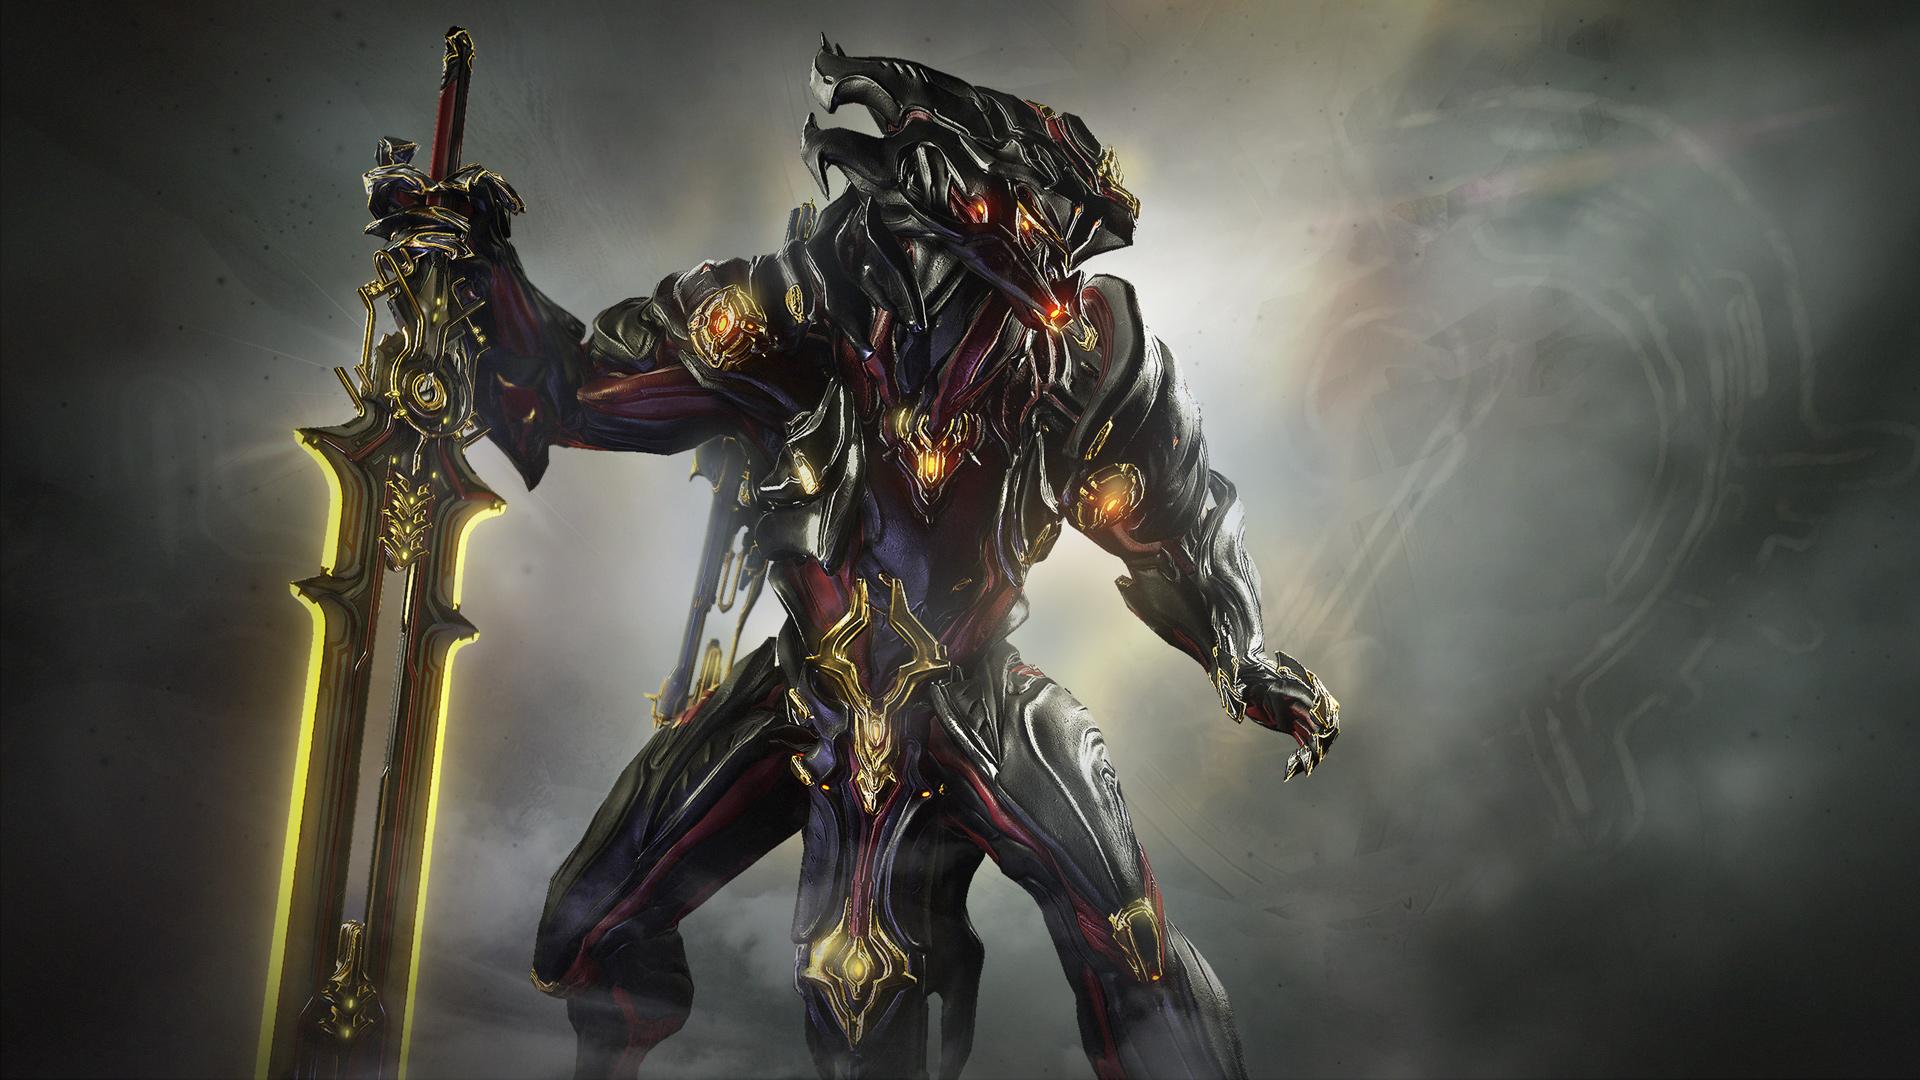 Chroma Prime arrives in Warframe - That VideoGame Blog